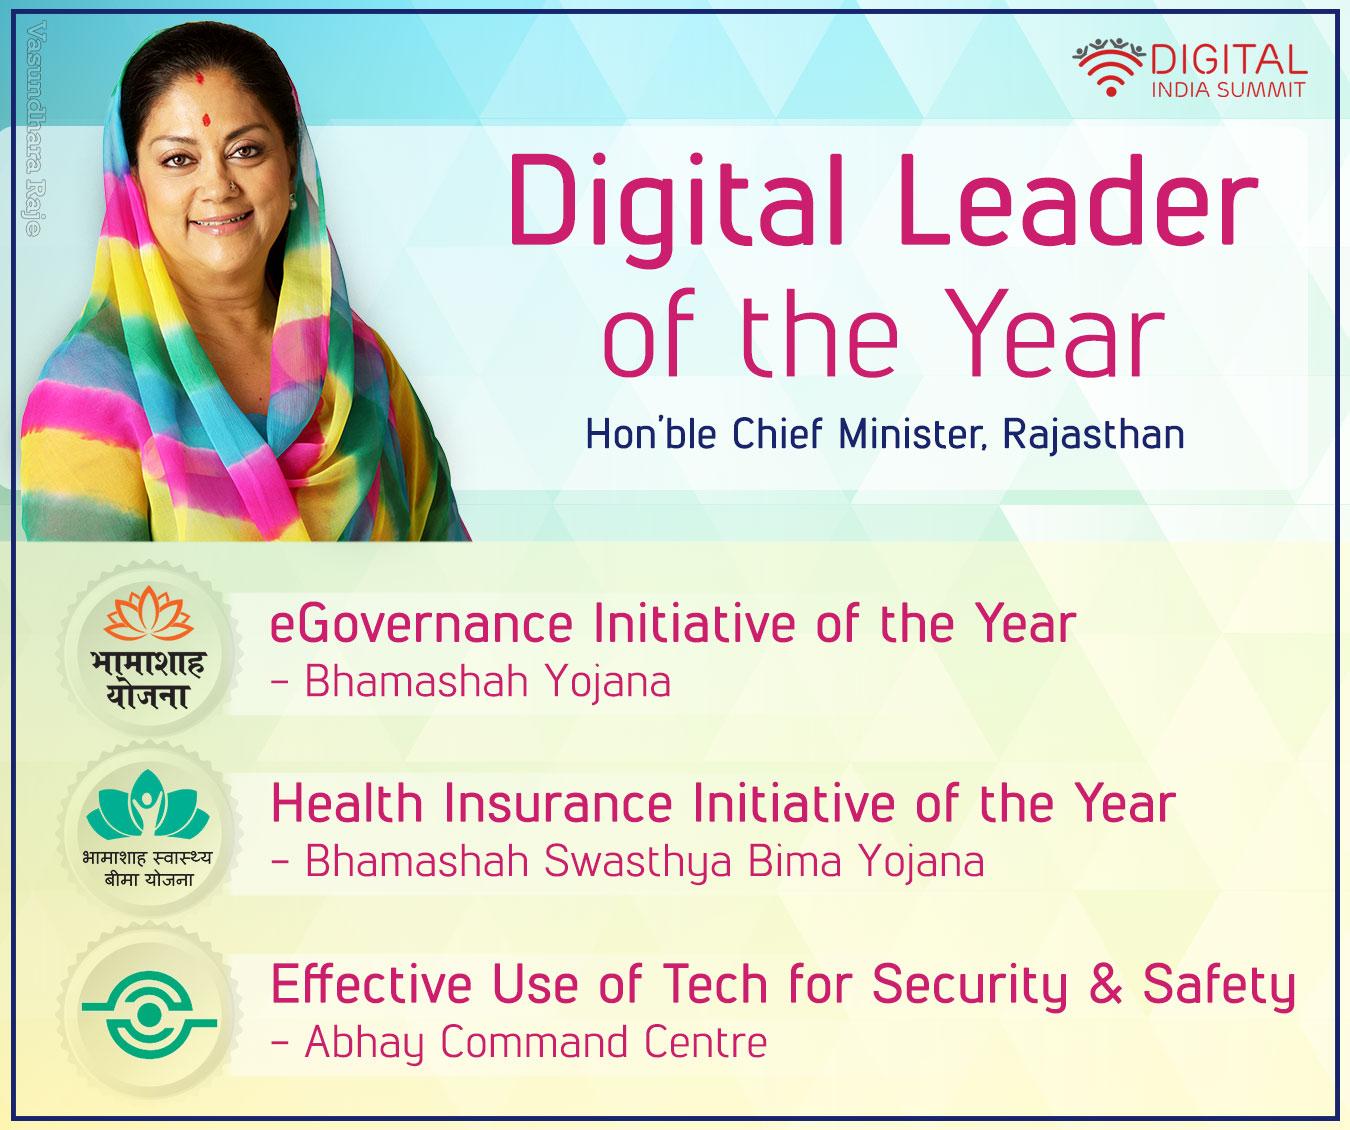 cm-wins-digital-leader-of-year-award-2017